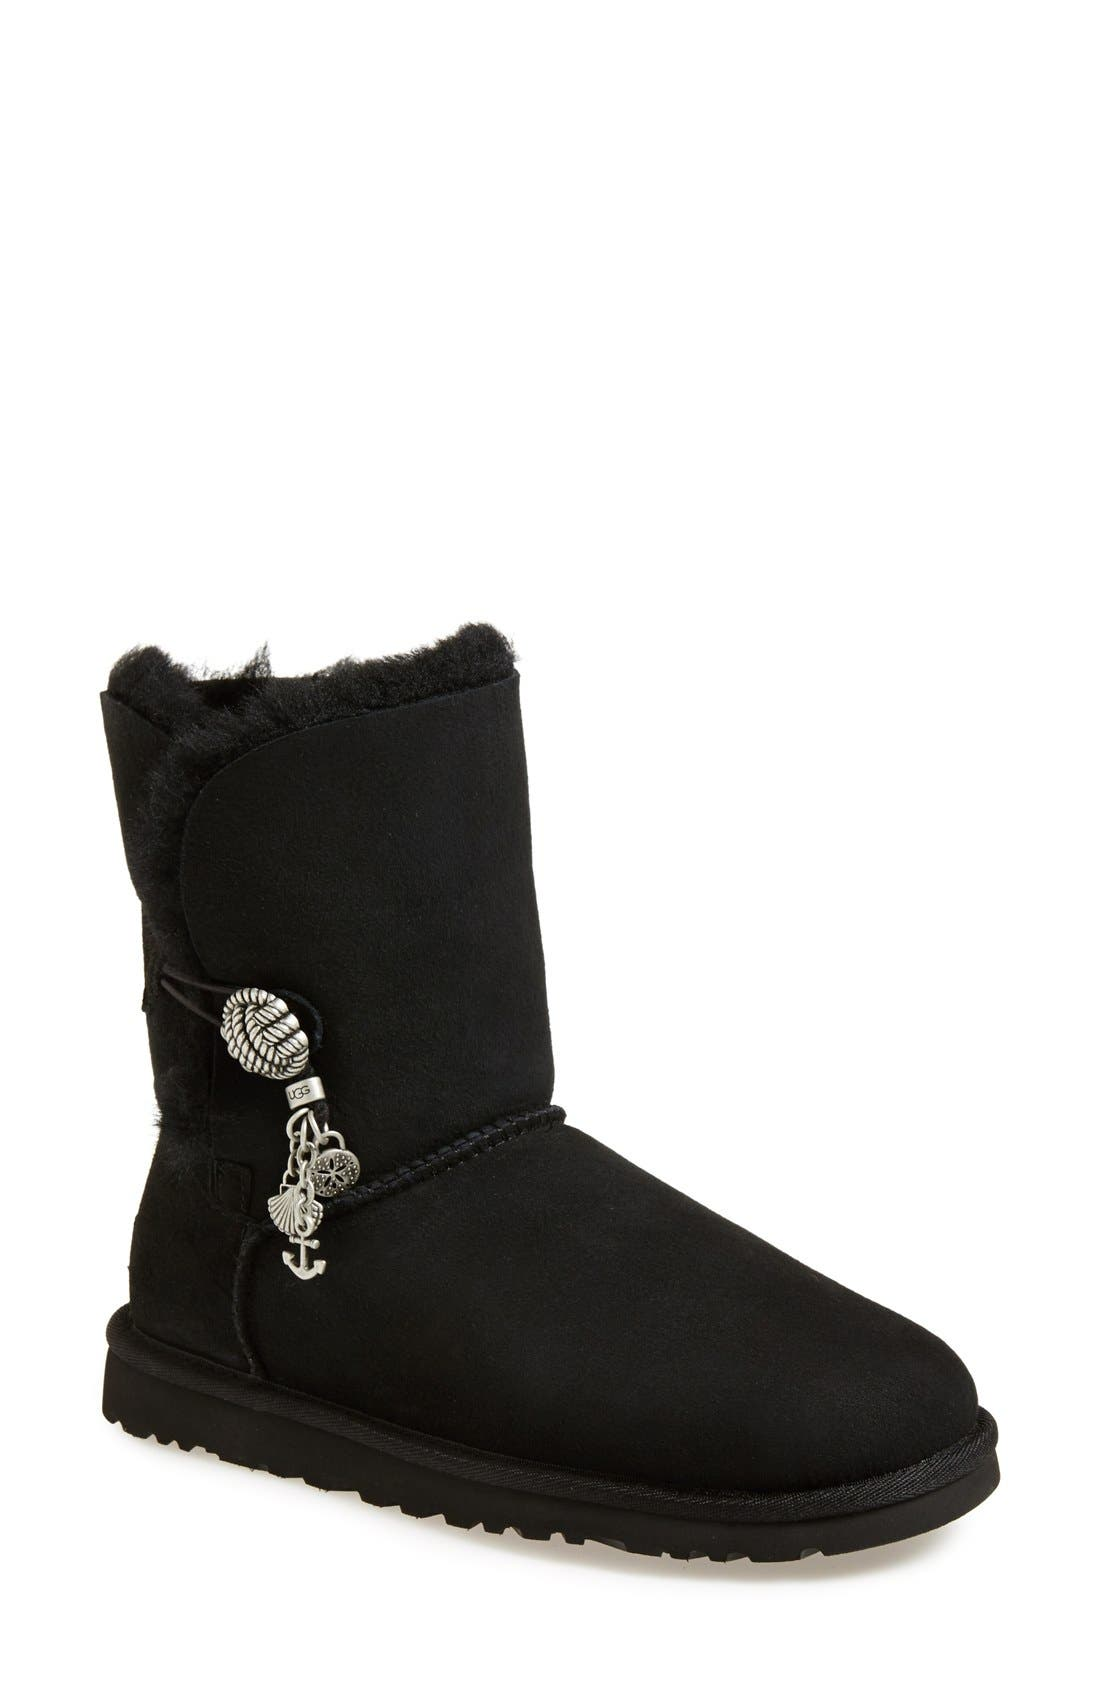 Main Image - UGG® Australia 'Briana' Charm Boot (Women)